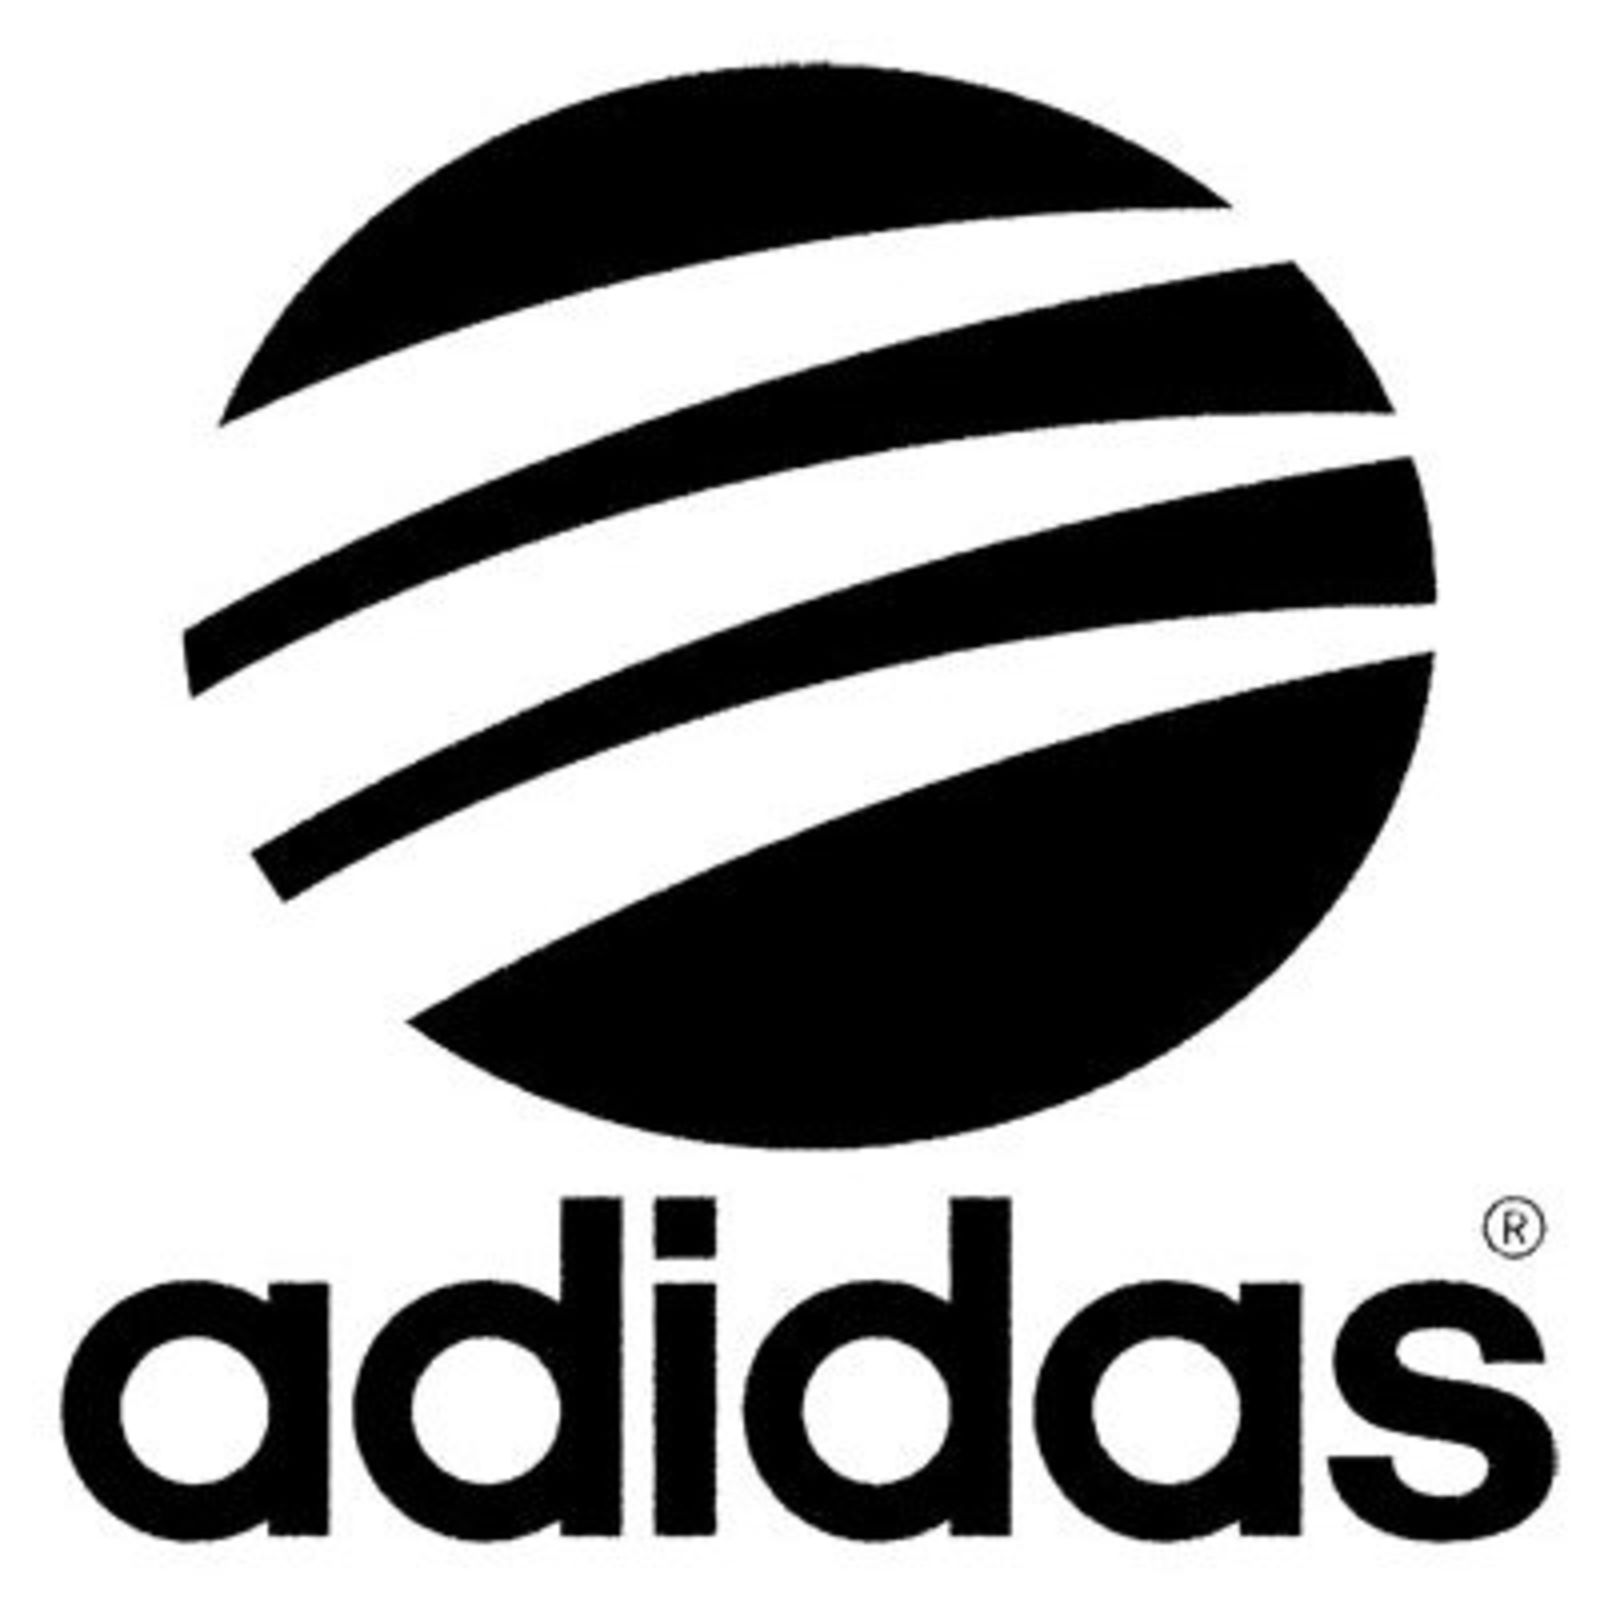 adidas NEO (Image 1)